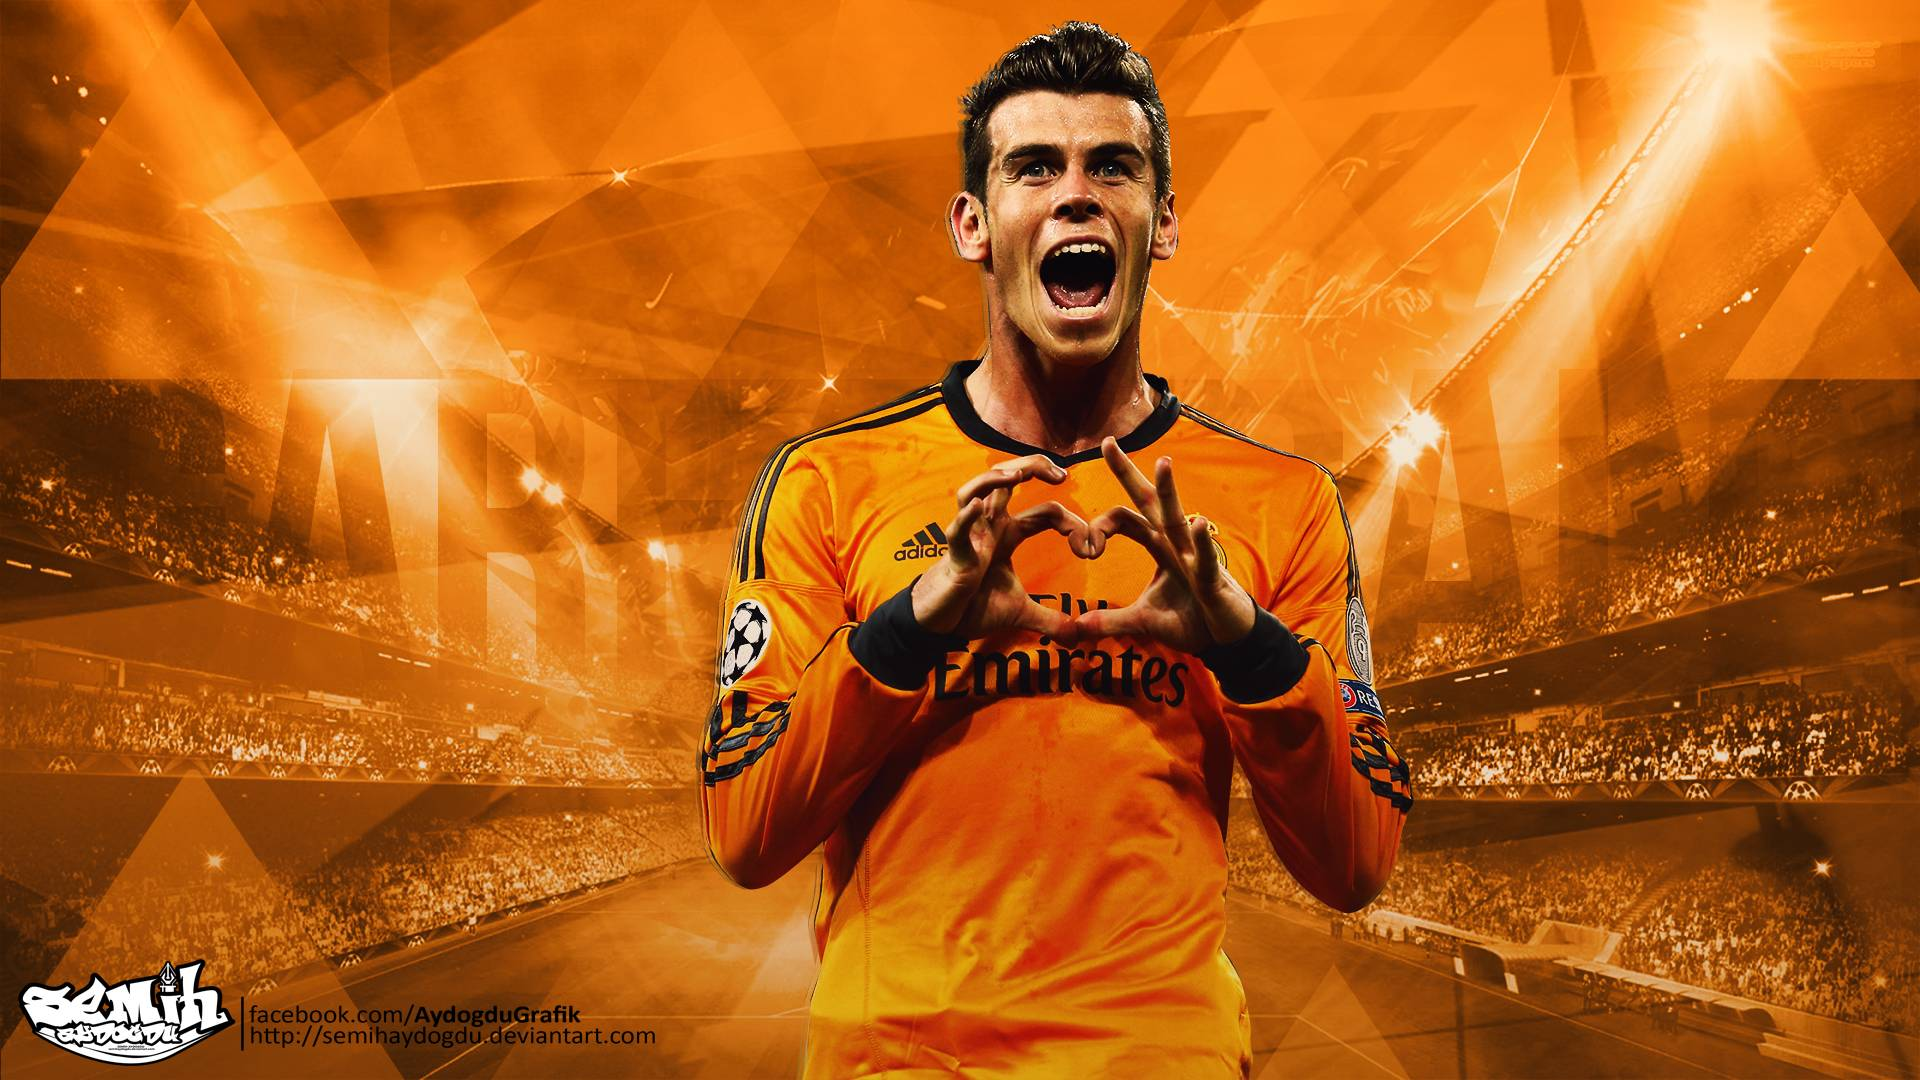 real madrid 2014 wallpaper gareth bale | Football HD Wallpapers